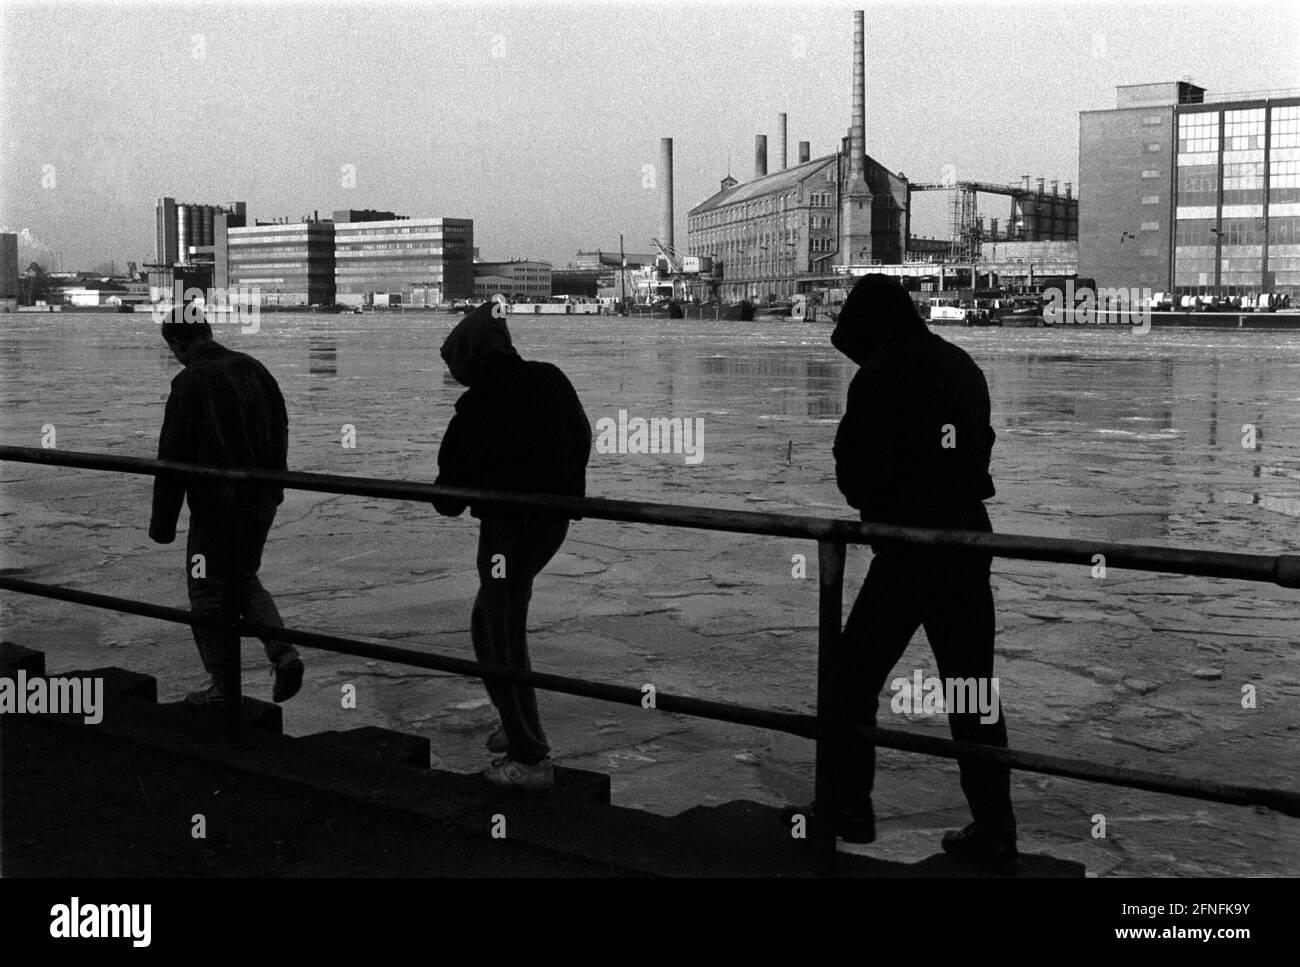 Young people at the river Spree in the industrial area Schoeneweide, Kabelwerk Oberspree (KWO ), Berlin-Schoeneweide, 02.02.1991, [automated translation] Stock Photo